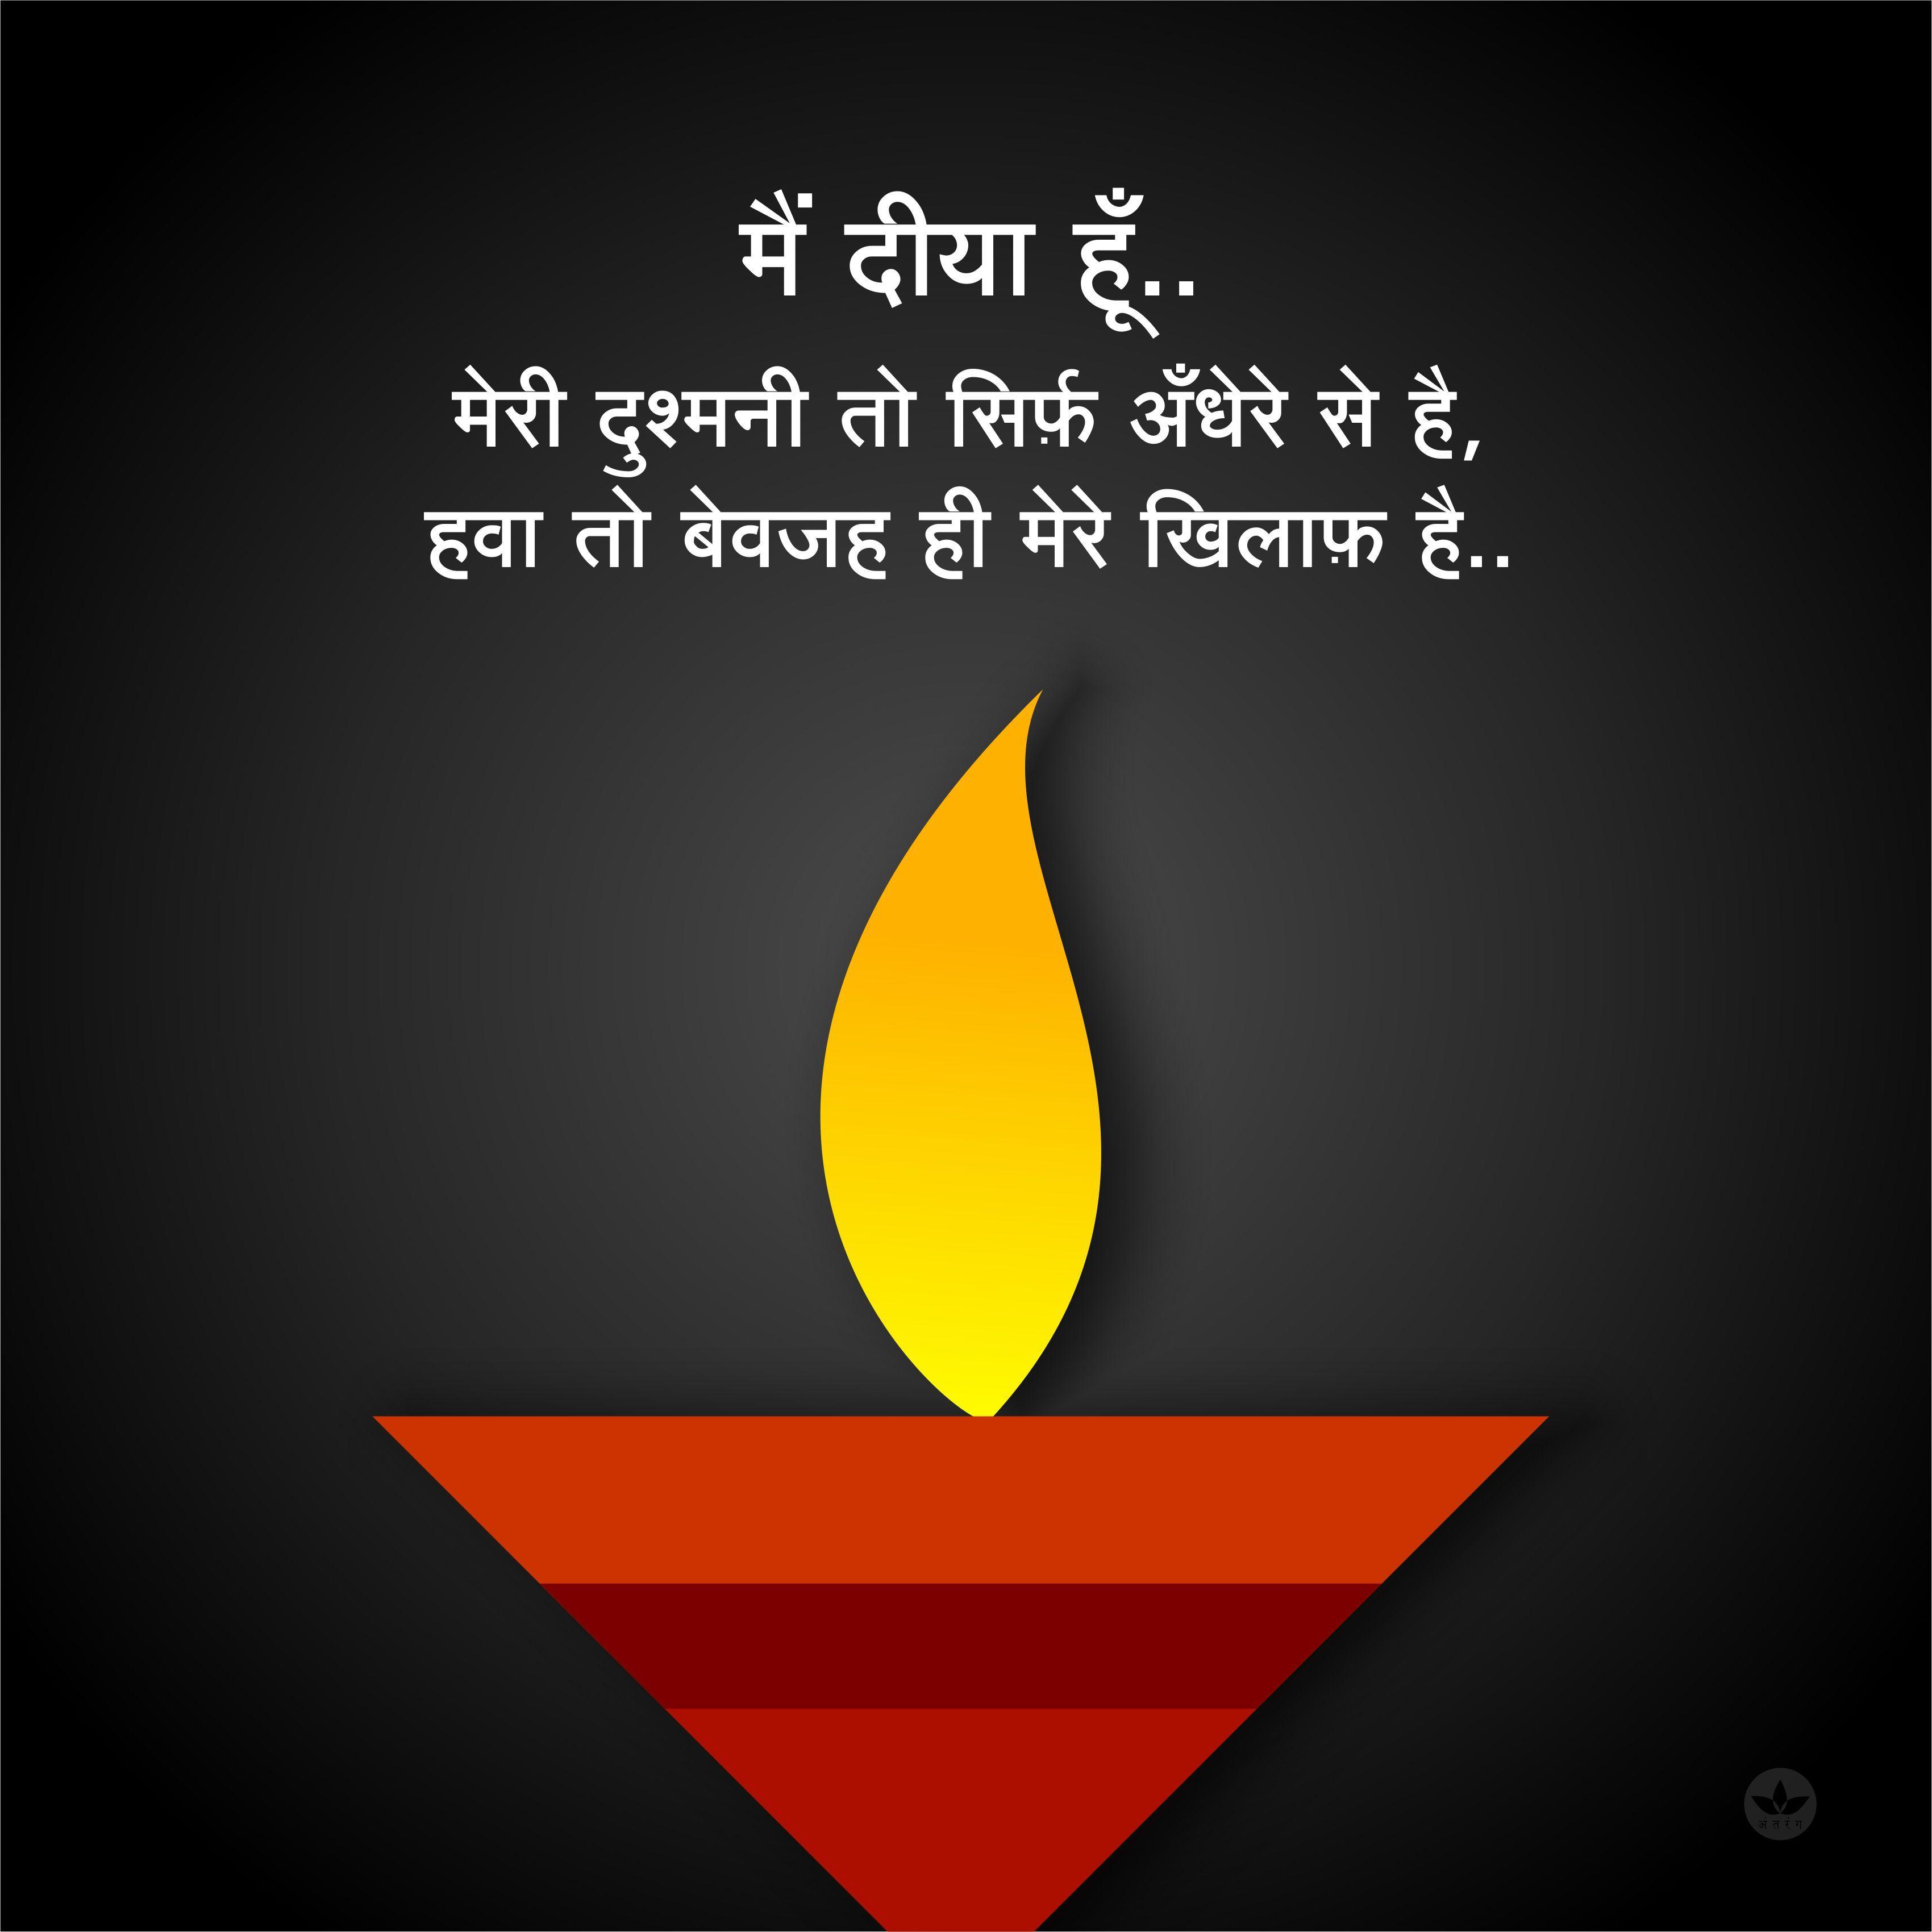 Pin By Ishu On Shayari Inspirational Quotes Motivational Quotes Diwali Quotes